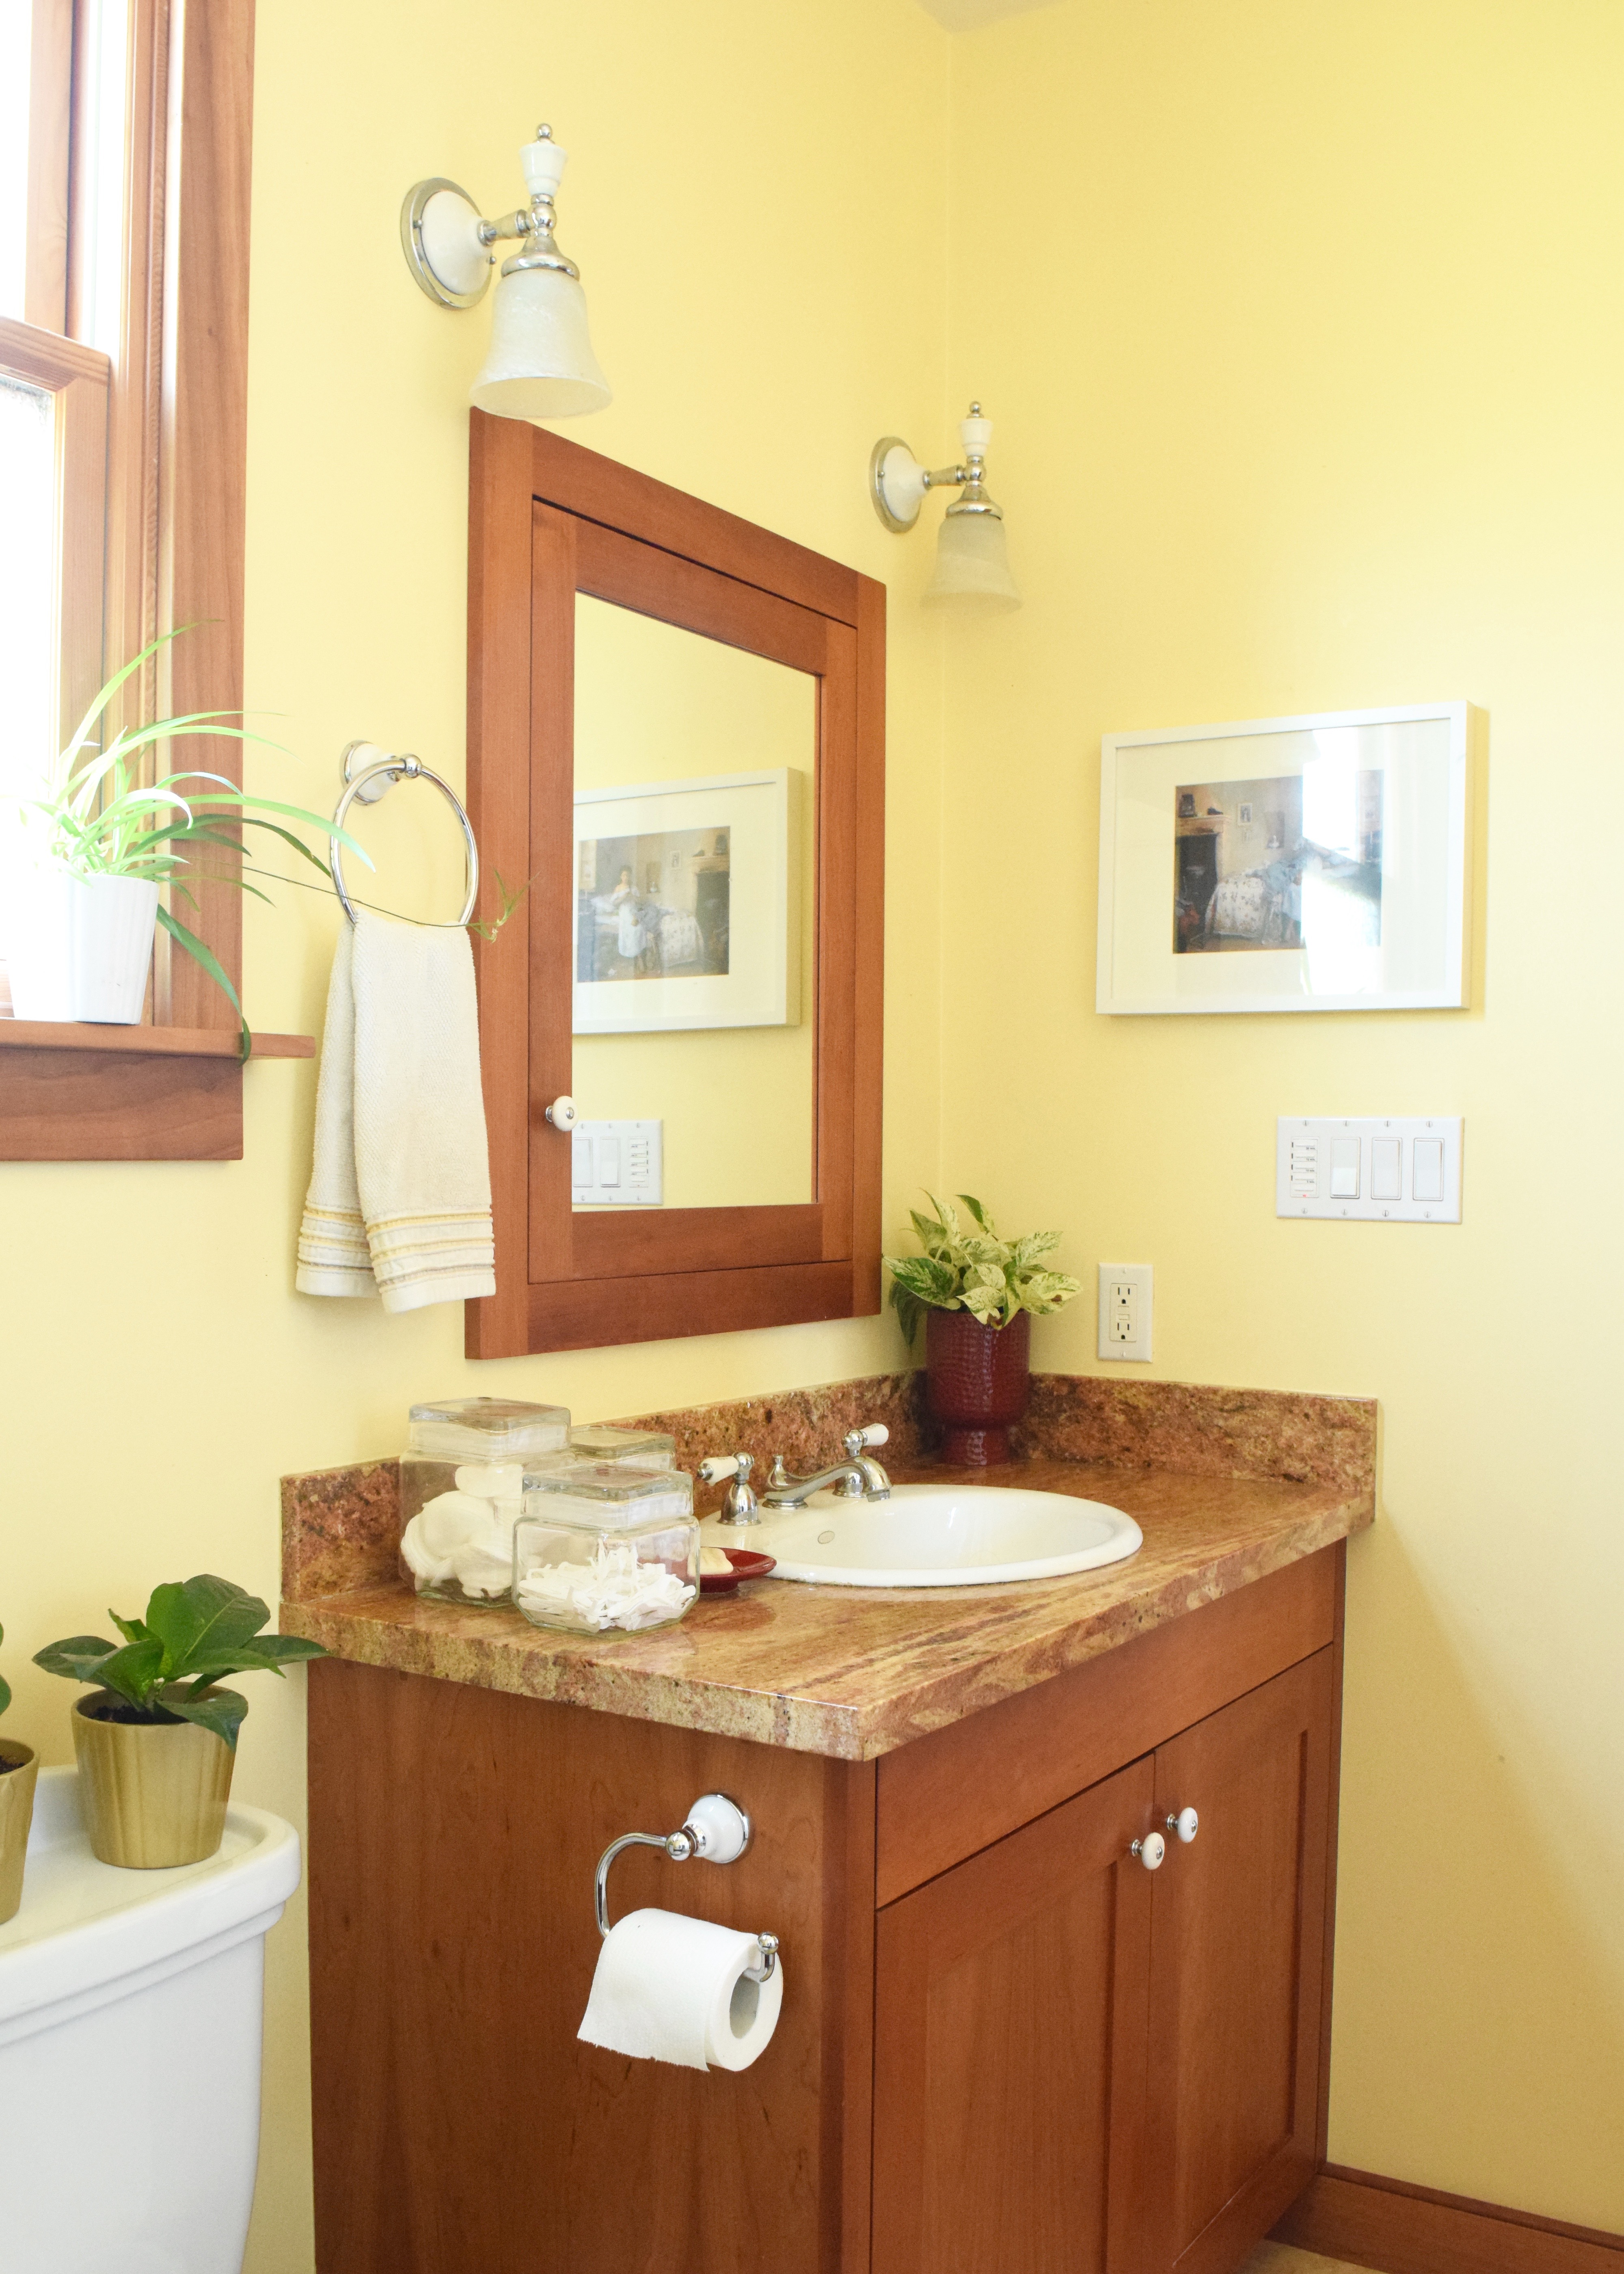 Bungalow Bathroom Afters | Land of Laurel